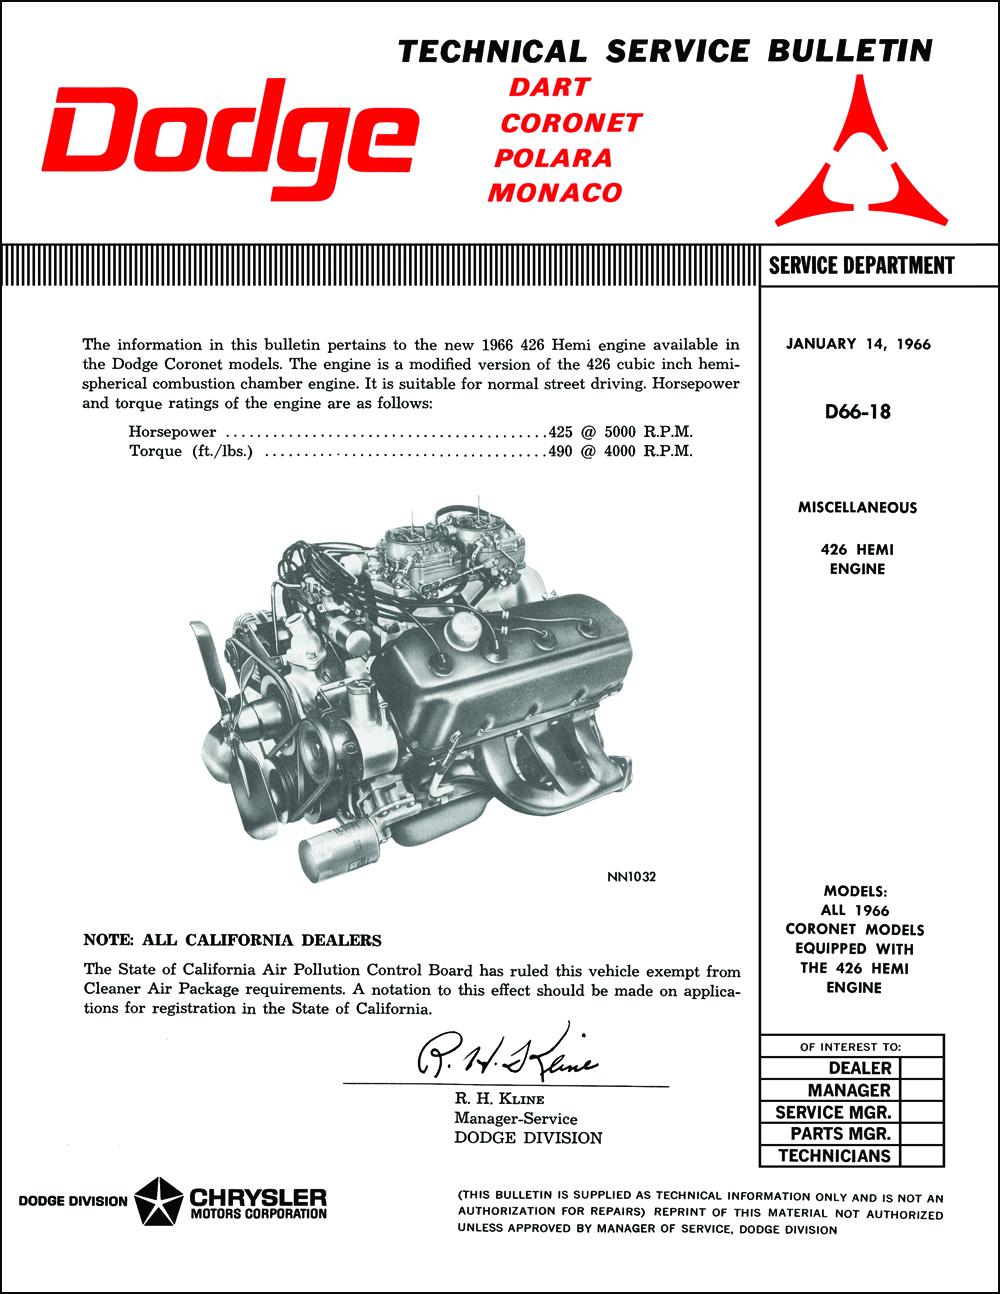 1966 Dodge Hemi Engine Repair Shop Manual Reprint SupplementFaxon Auto Literature